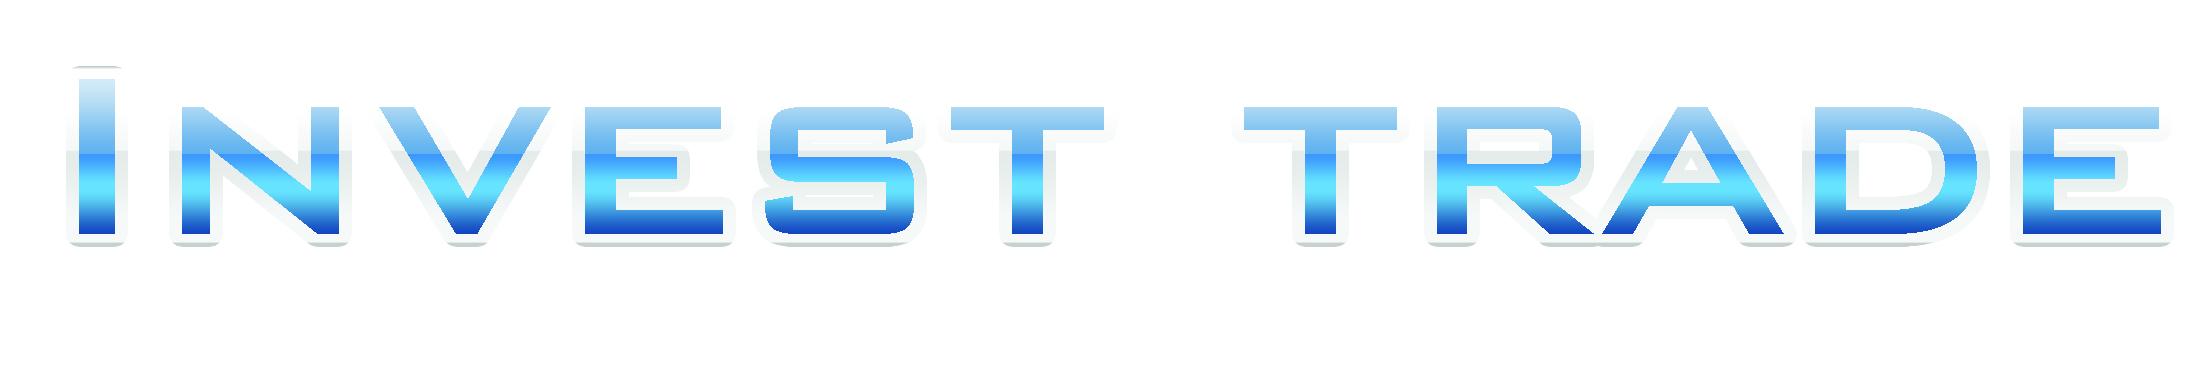 Разработка логотипа для компании Invest trade фото f_873511f6d33db2a4.jpg